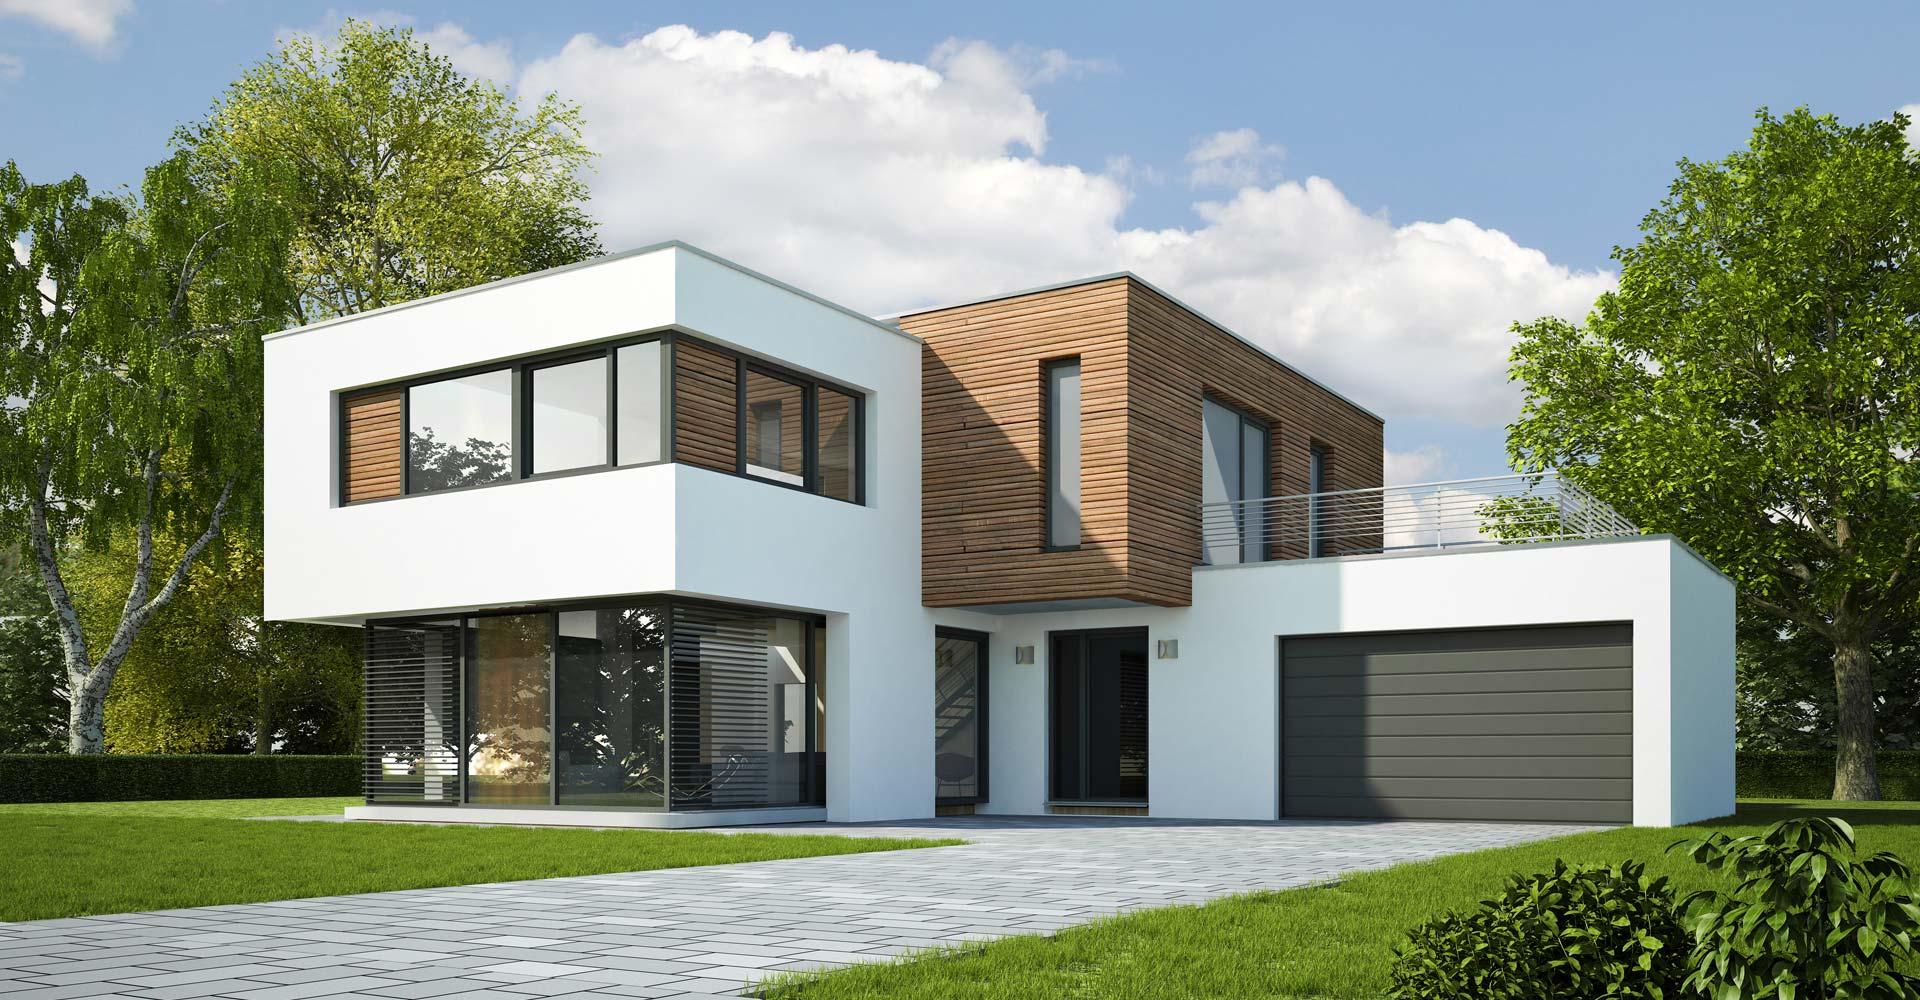 Immobilienberatung Solf